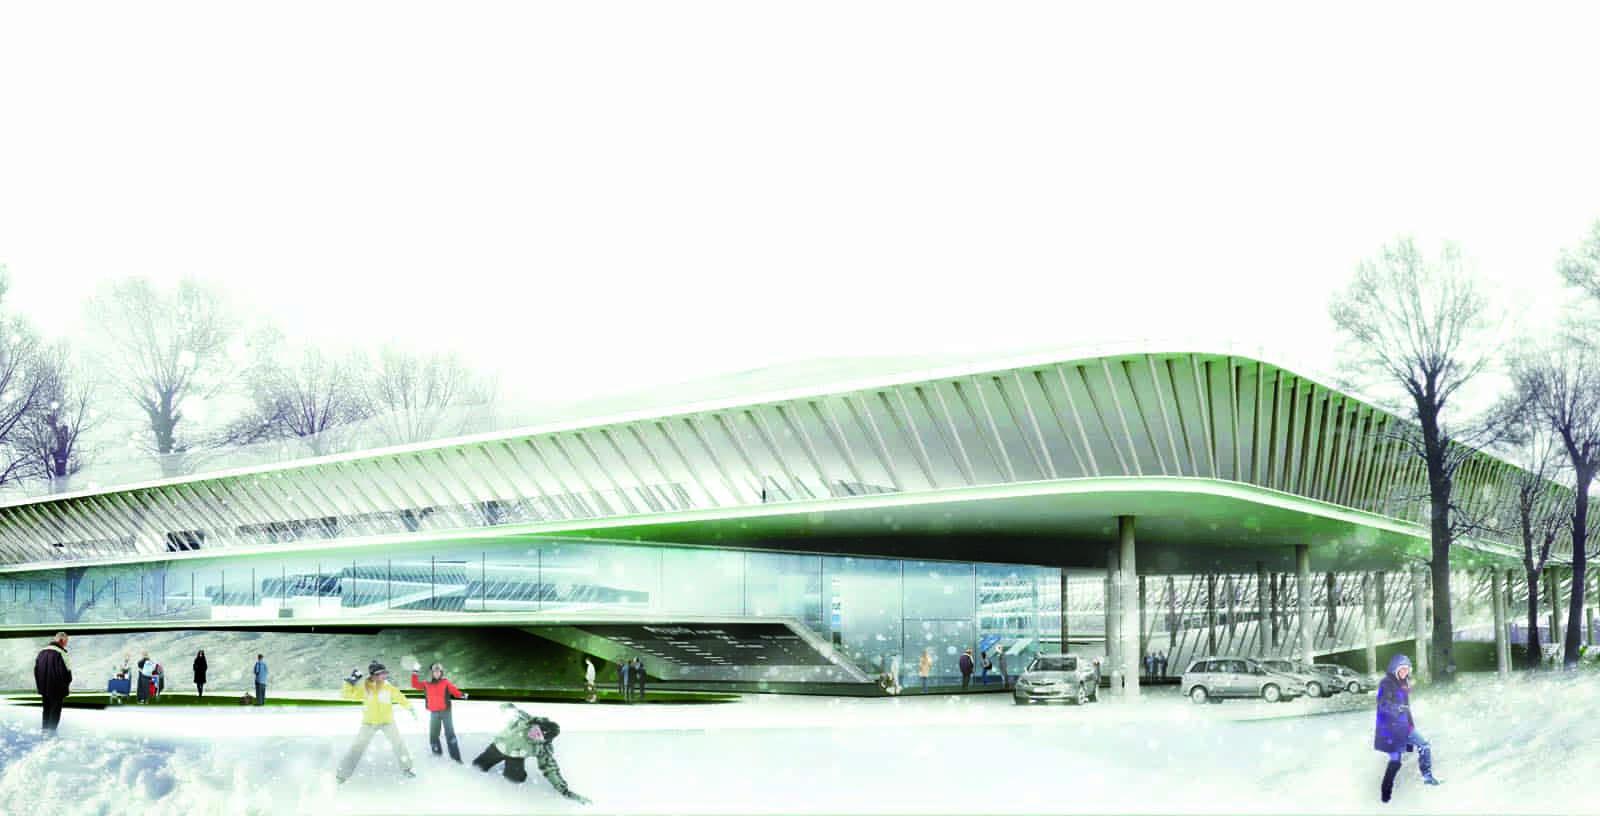 High_Speed_Station_Poland_01_Architecture_IDOM_computer_graphics_Ismael_Vega_Andreia_Faley